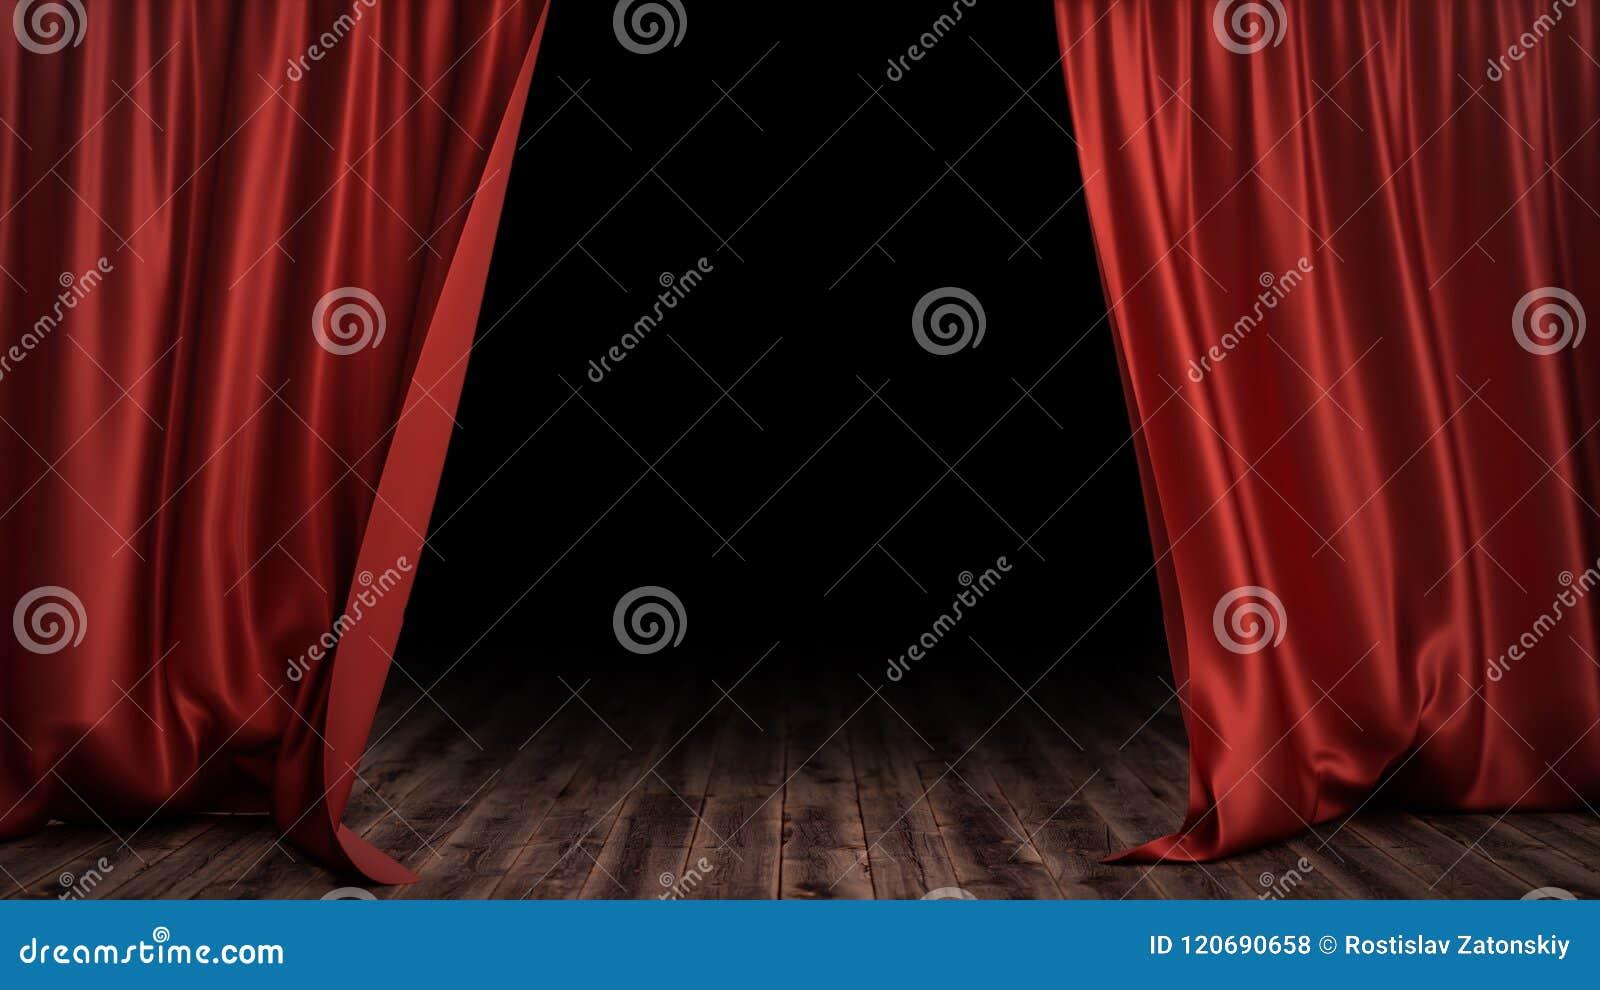 3d Illustration Luxury Red Silk Velvet Curtains Decoration Design